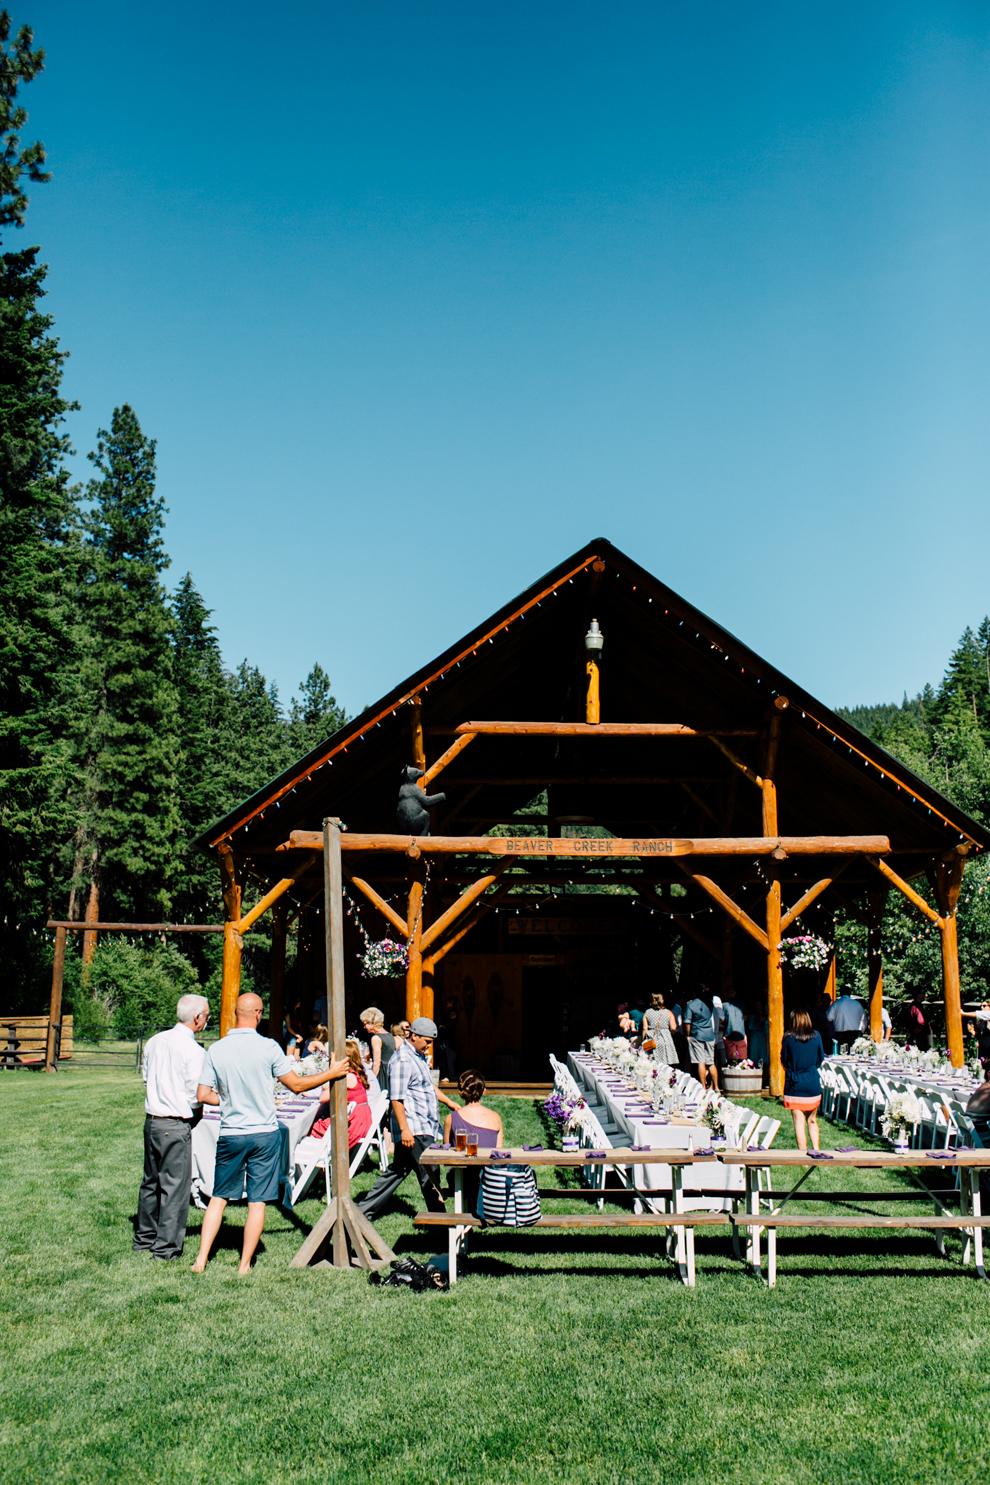 072-leavenworth-mountain-springs-lodge-wedding-karena-saul-katheryn-moran-photography.jpg